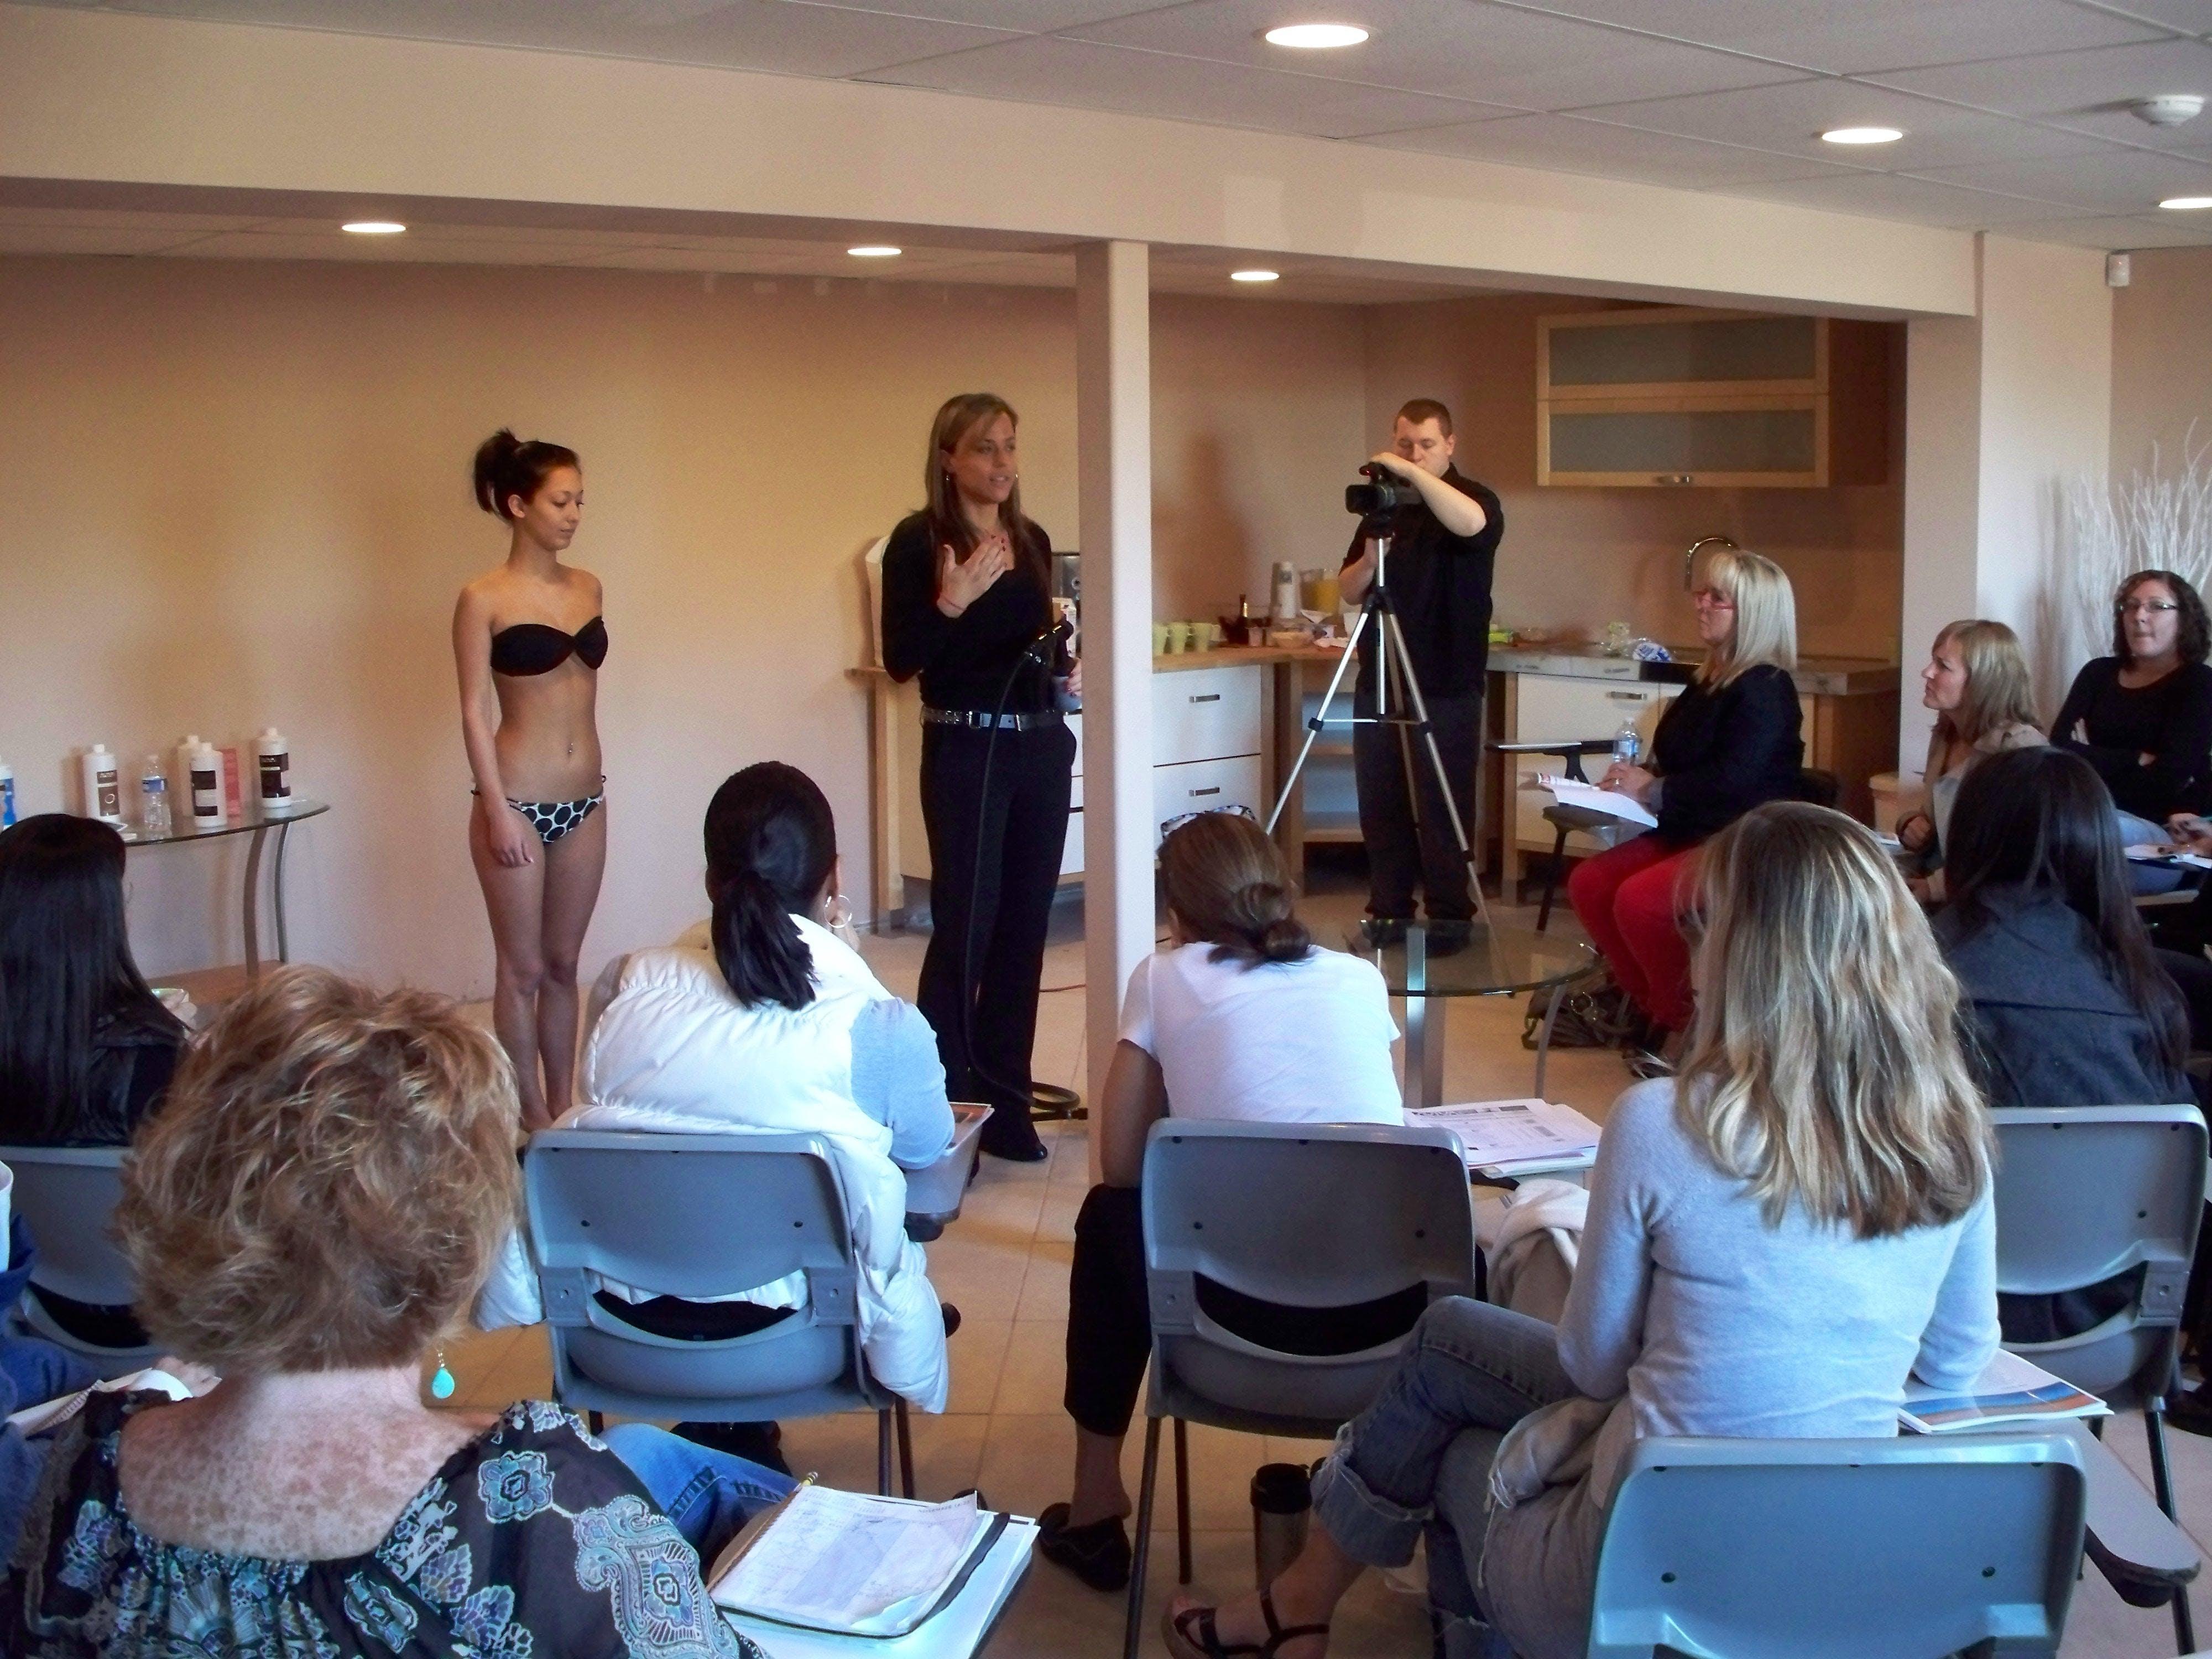 Phoenix Spray Tan Training Class - Hands-On Learning - July 28th